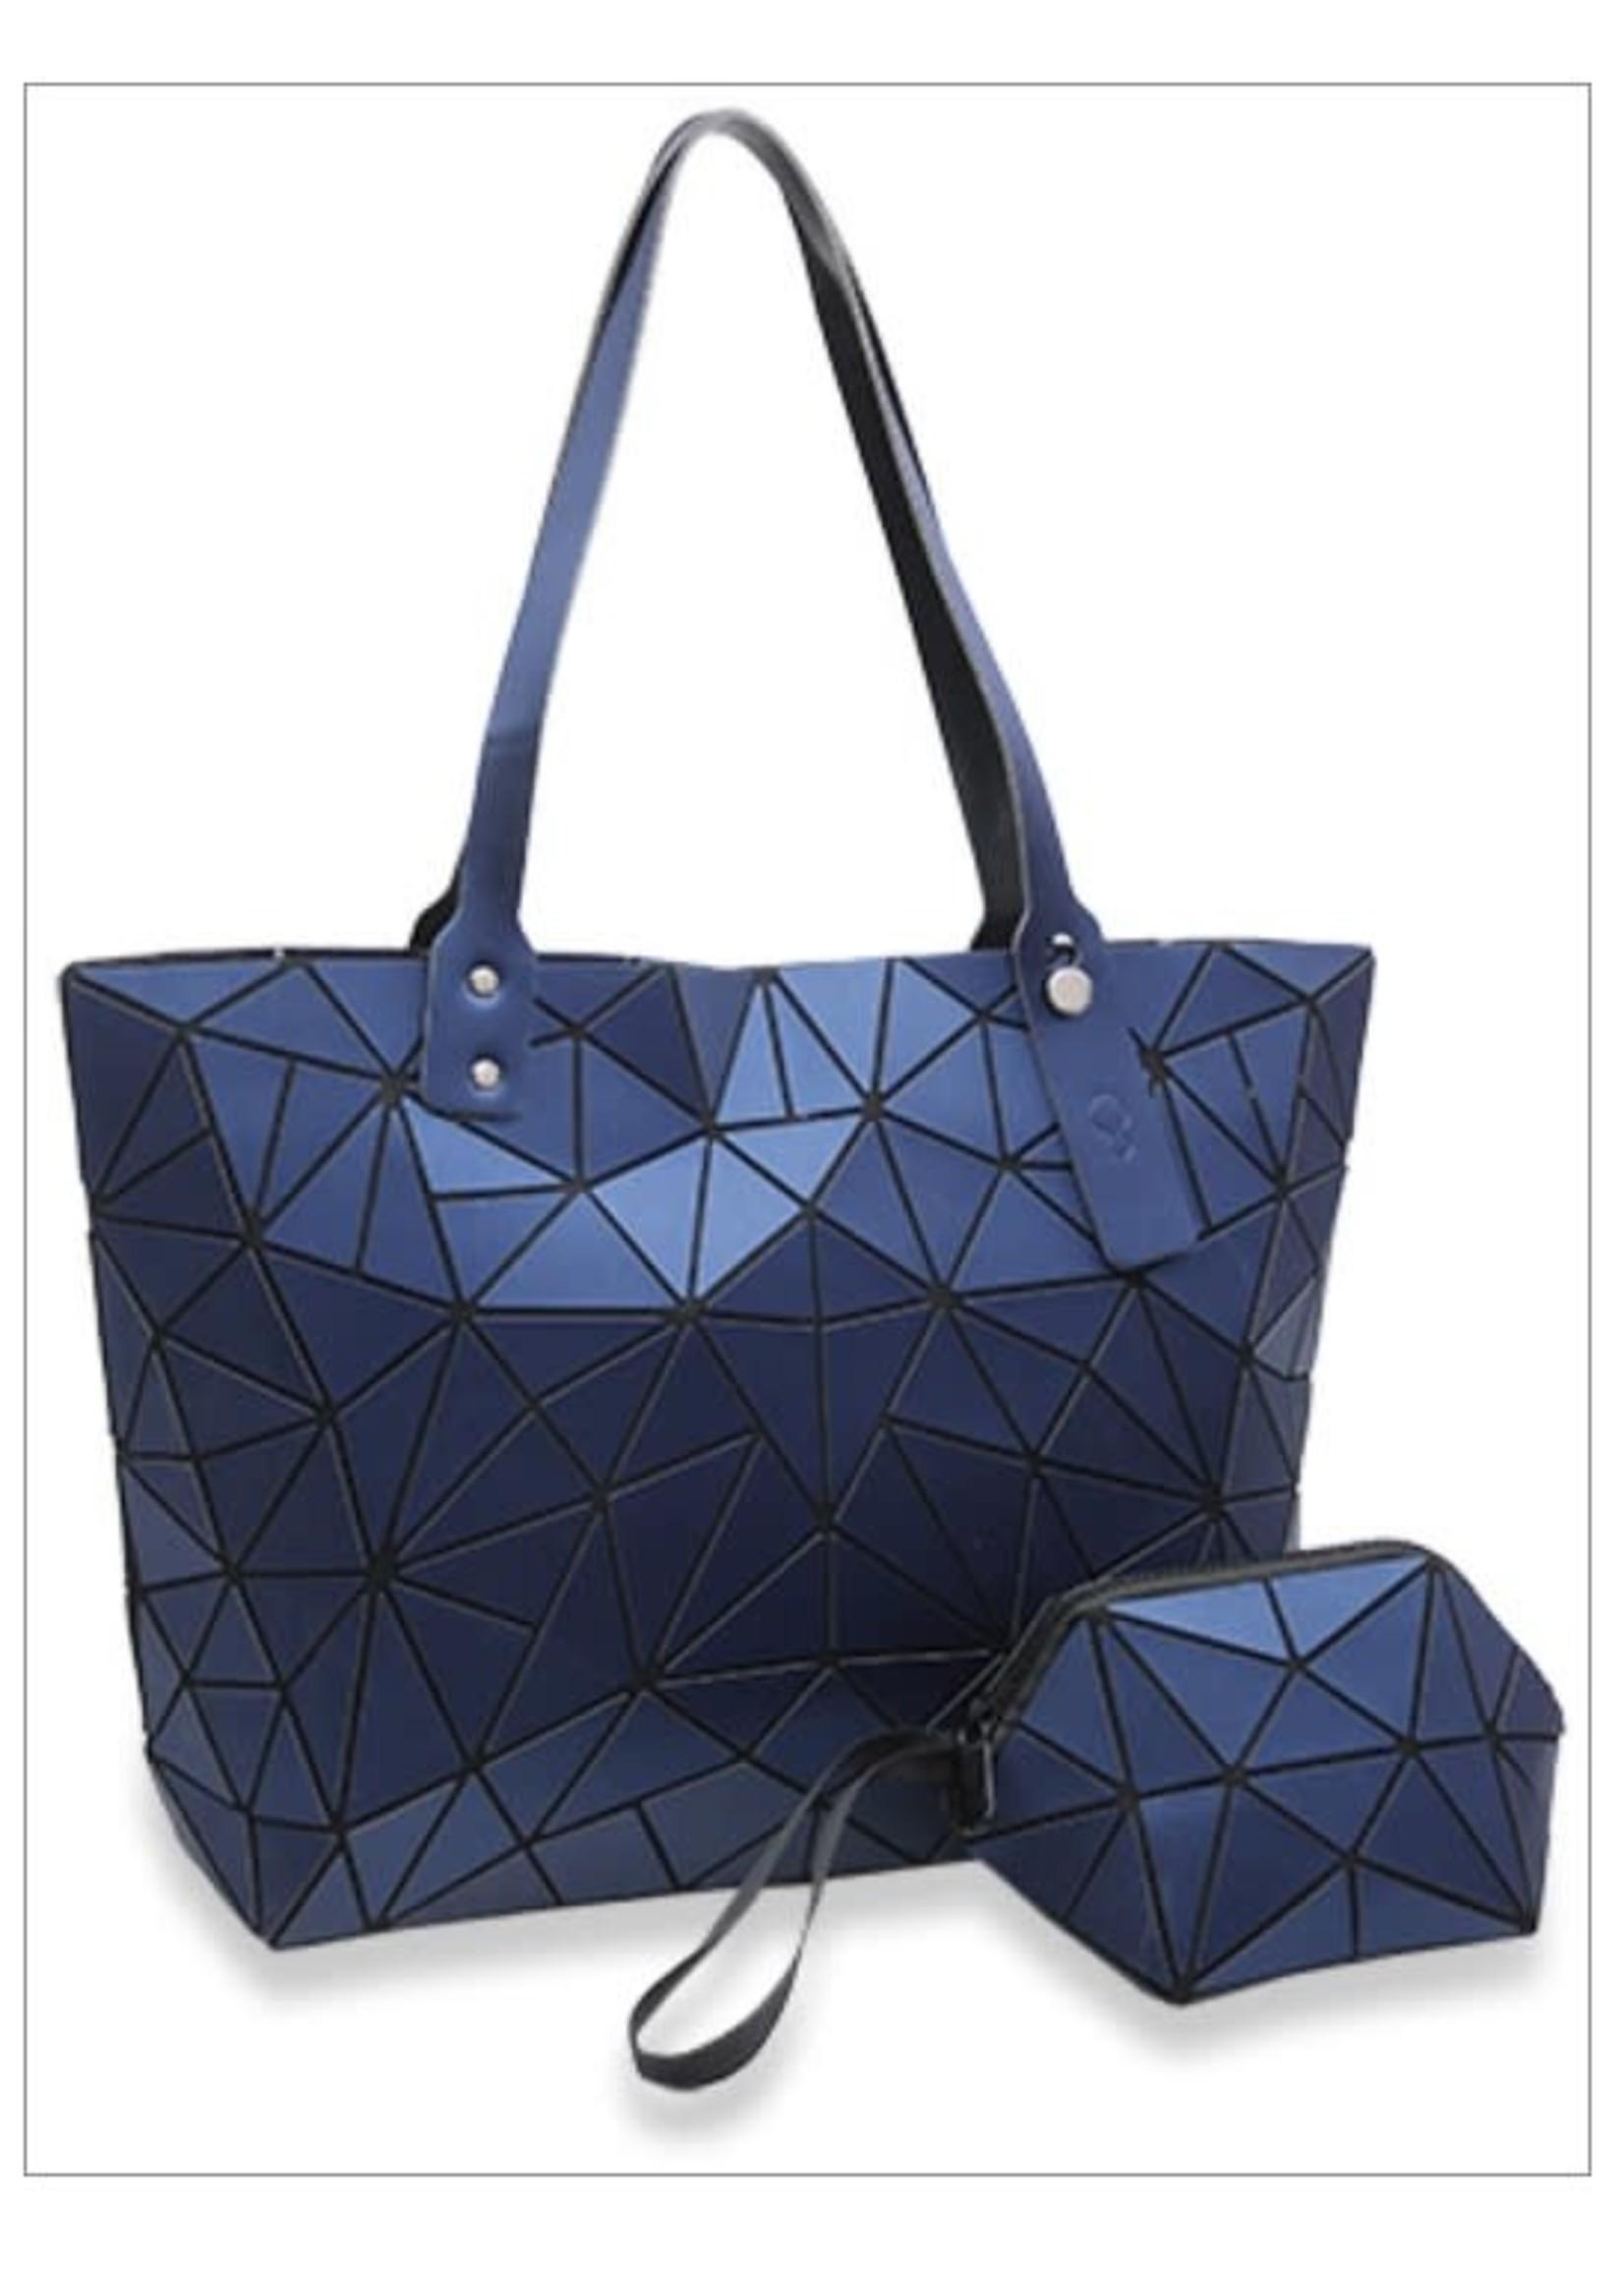 KDX Matte Prism Tote Handbag Set